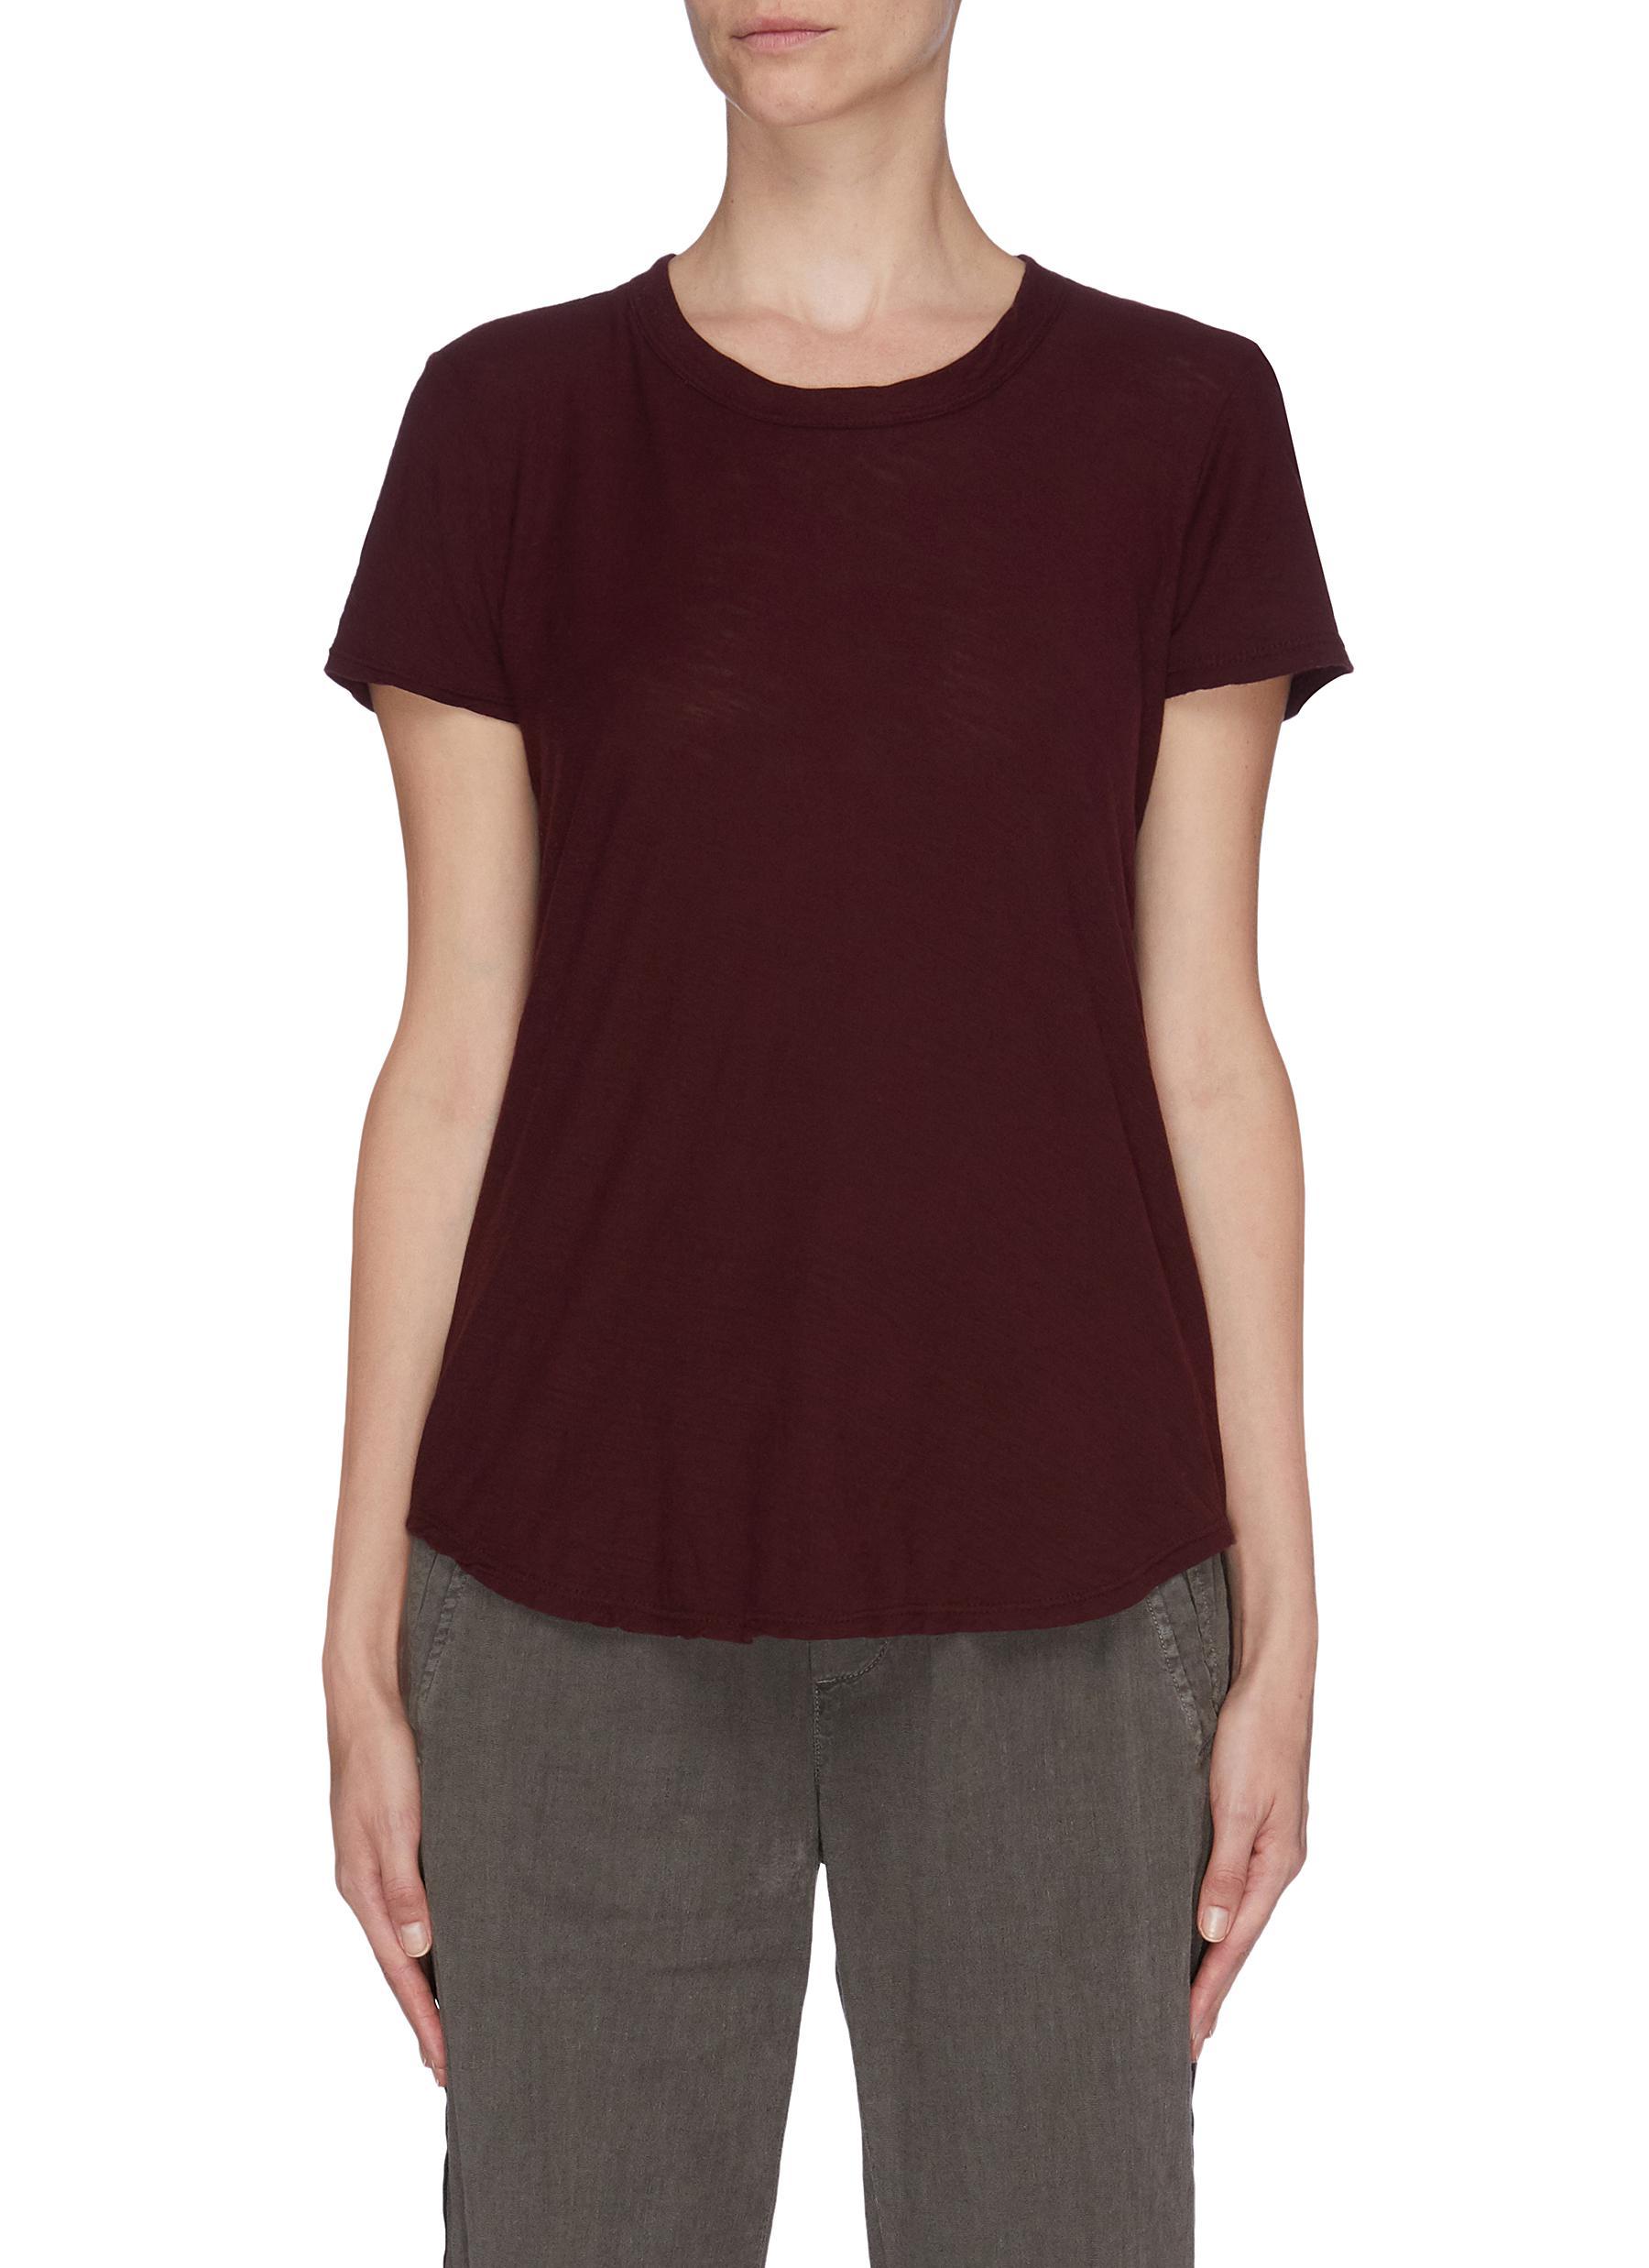 Buy James Perse Tops Sheer slub crew neck T-shirt